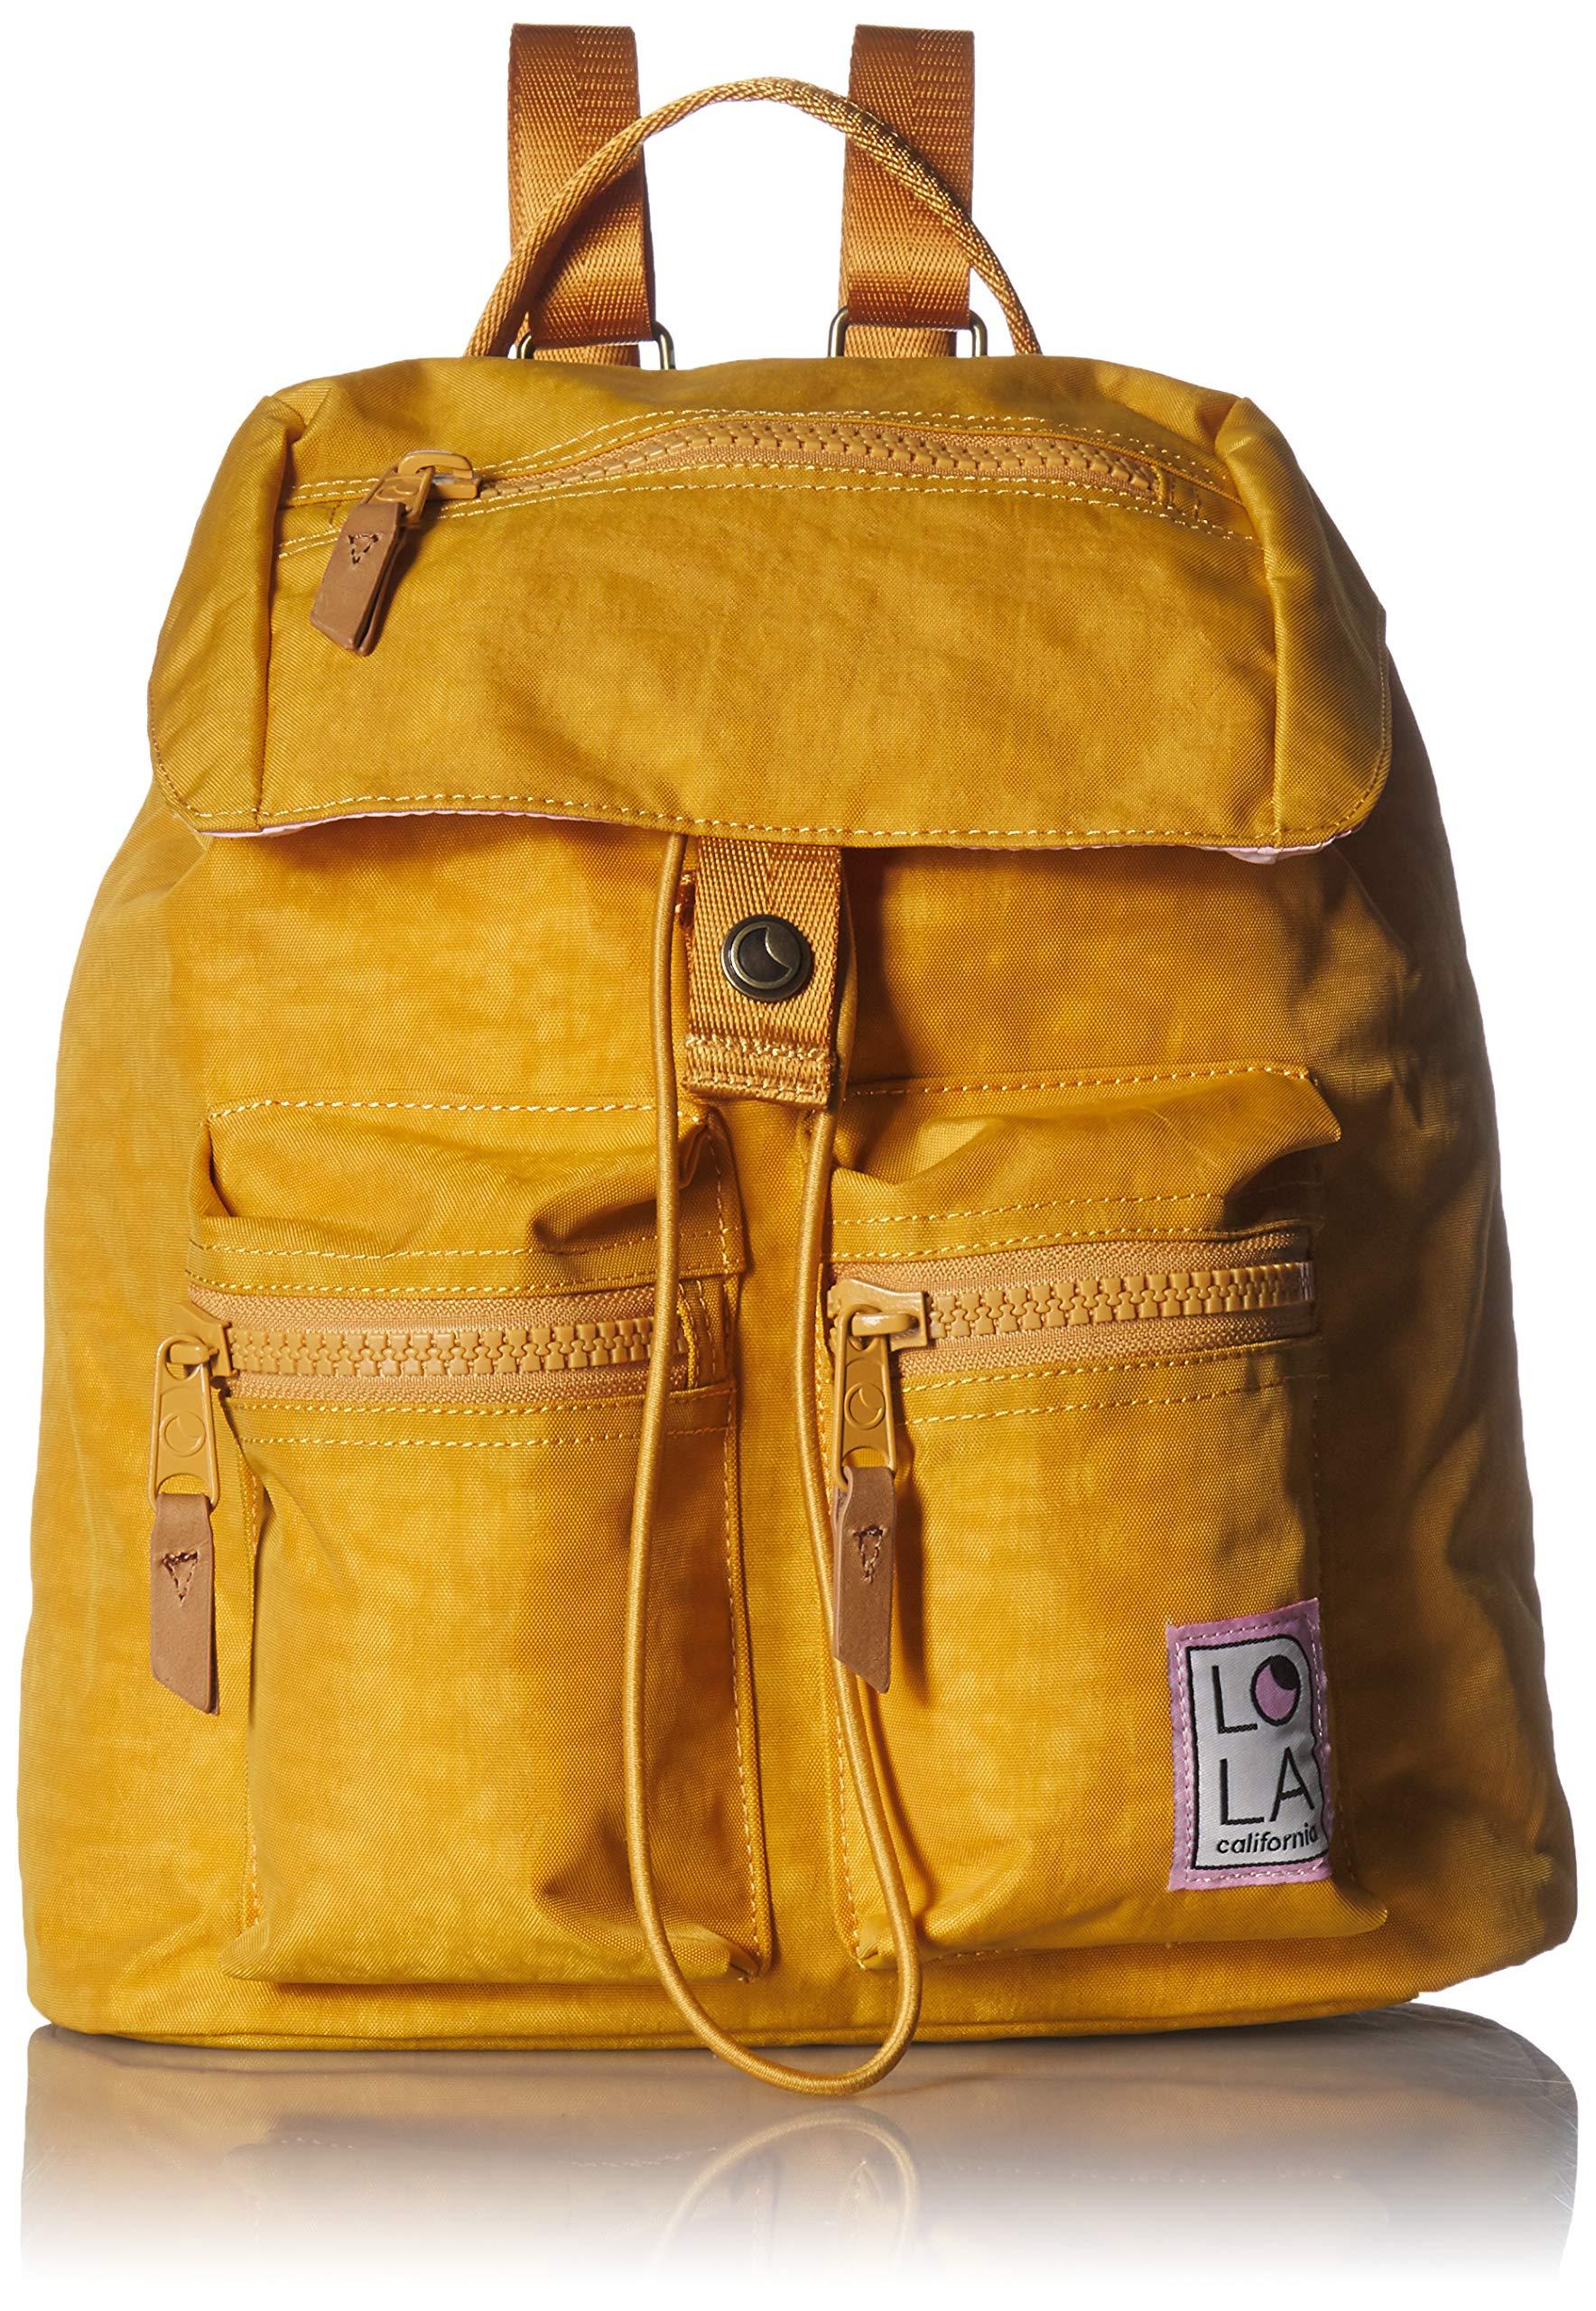 LOLA Mondo Phantasm Large Drawstring Backpack, Ochre